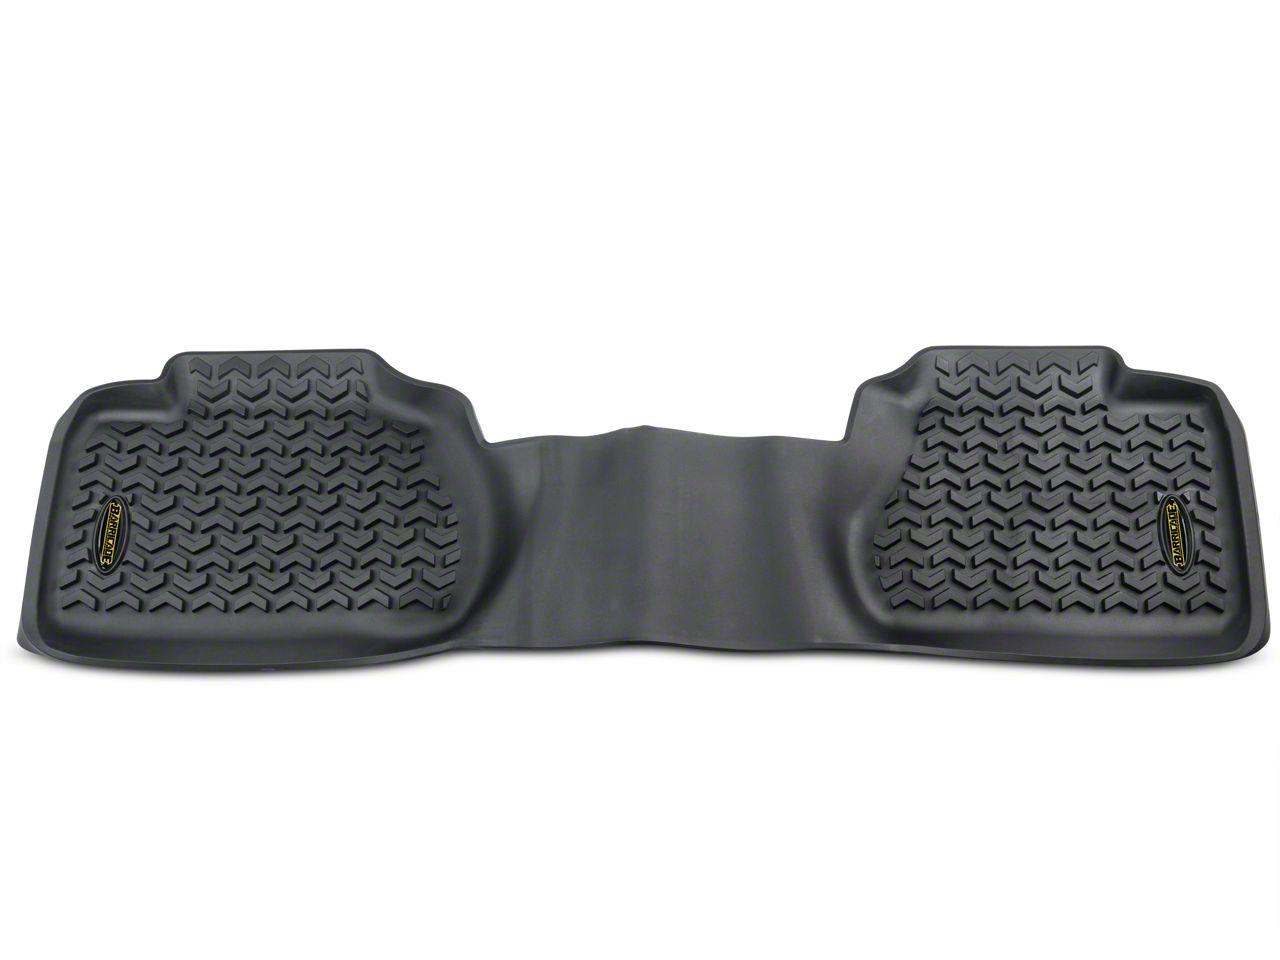 Barricade Rear Floor Mat - Black (07-13 Sierra 1500 Extended Cab)